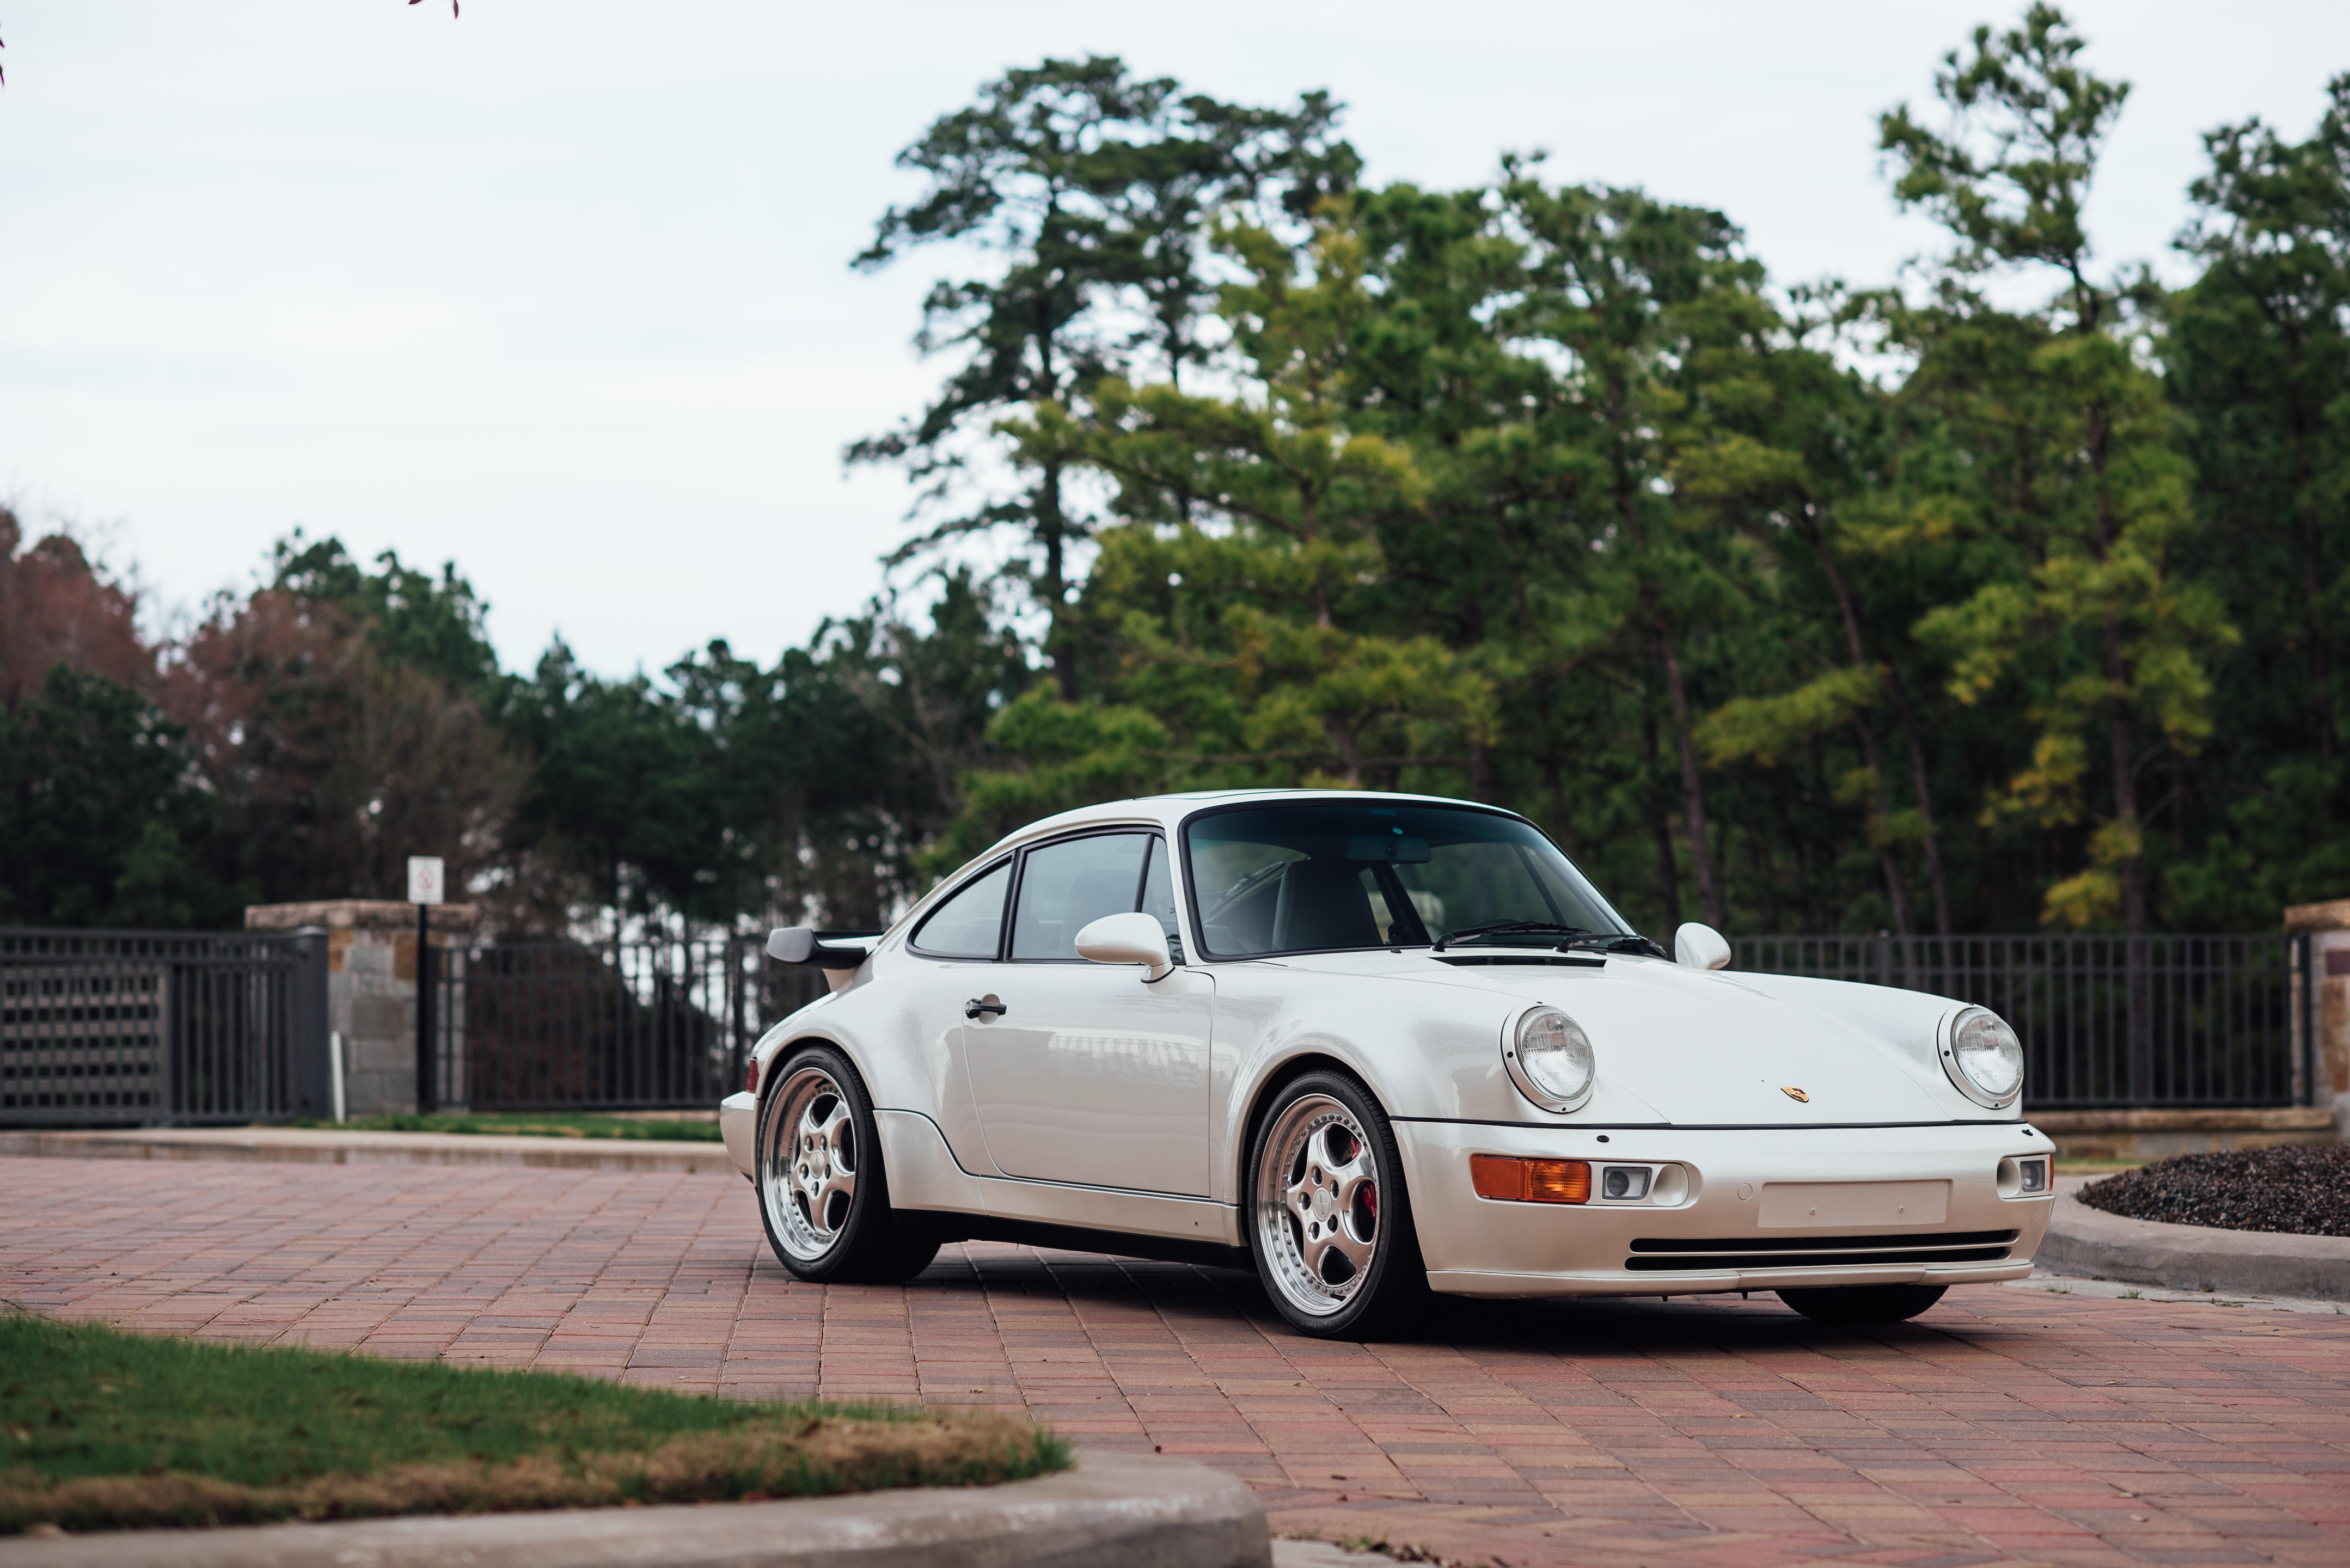 1992 Porsche 911 Turbo 3.3 CoupeVIN. WP0AA2963NS480308  Engine no. 61N01407